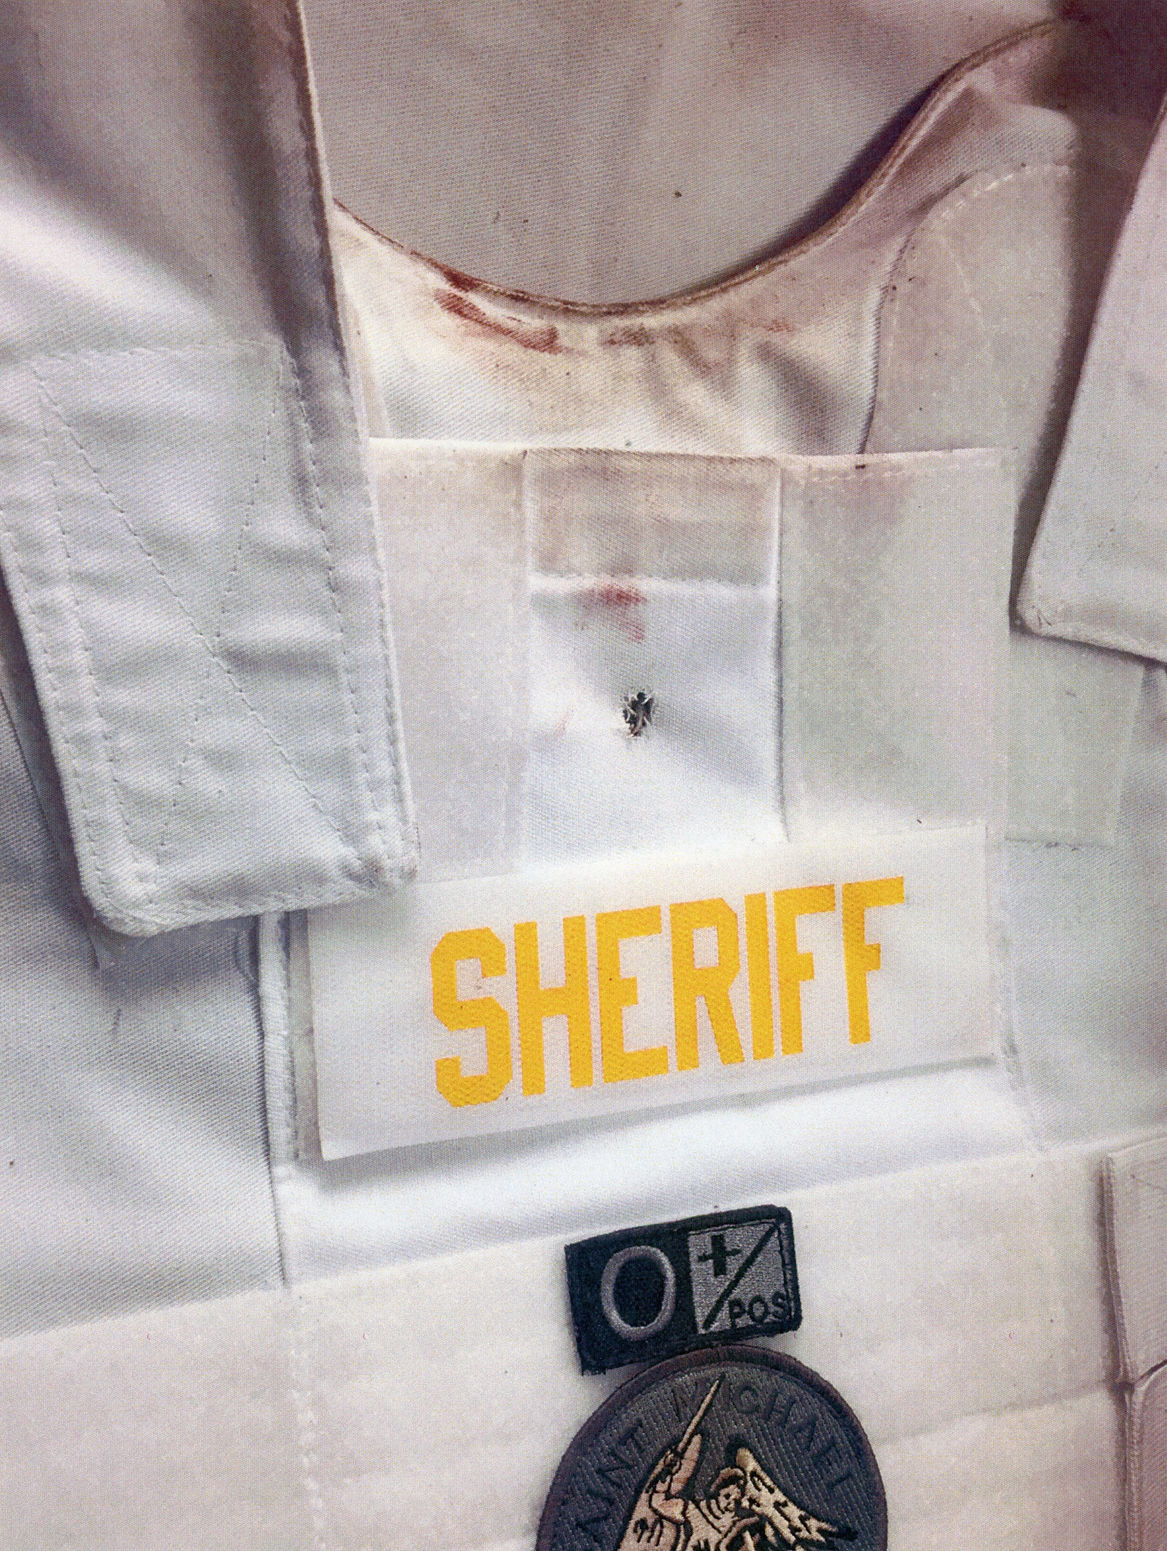 20-year-old man who shot Stafford County deputy in 2016